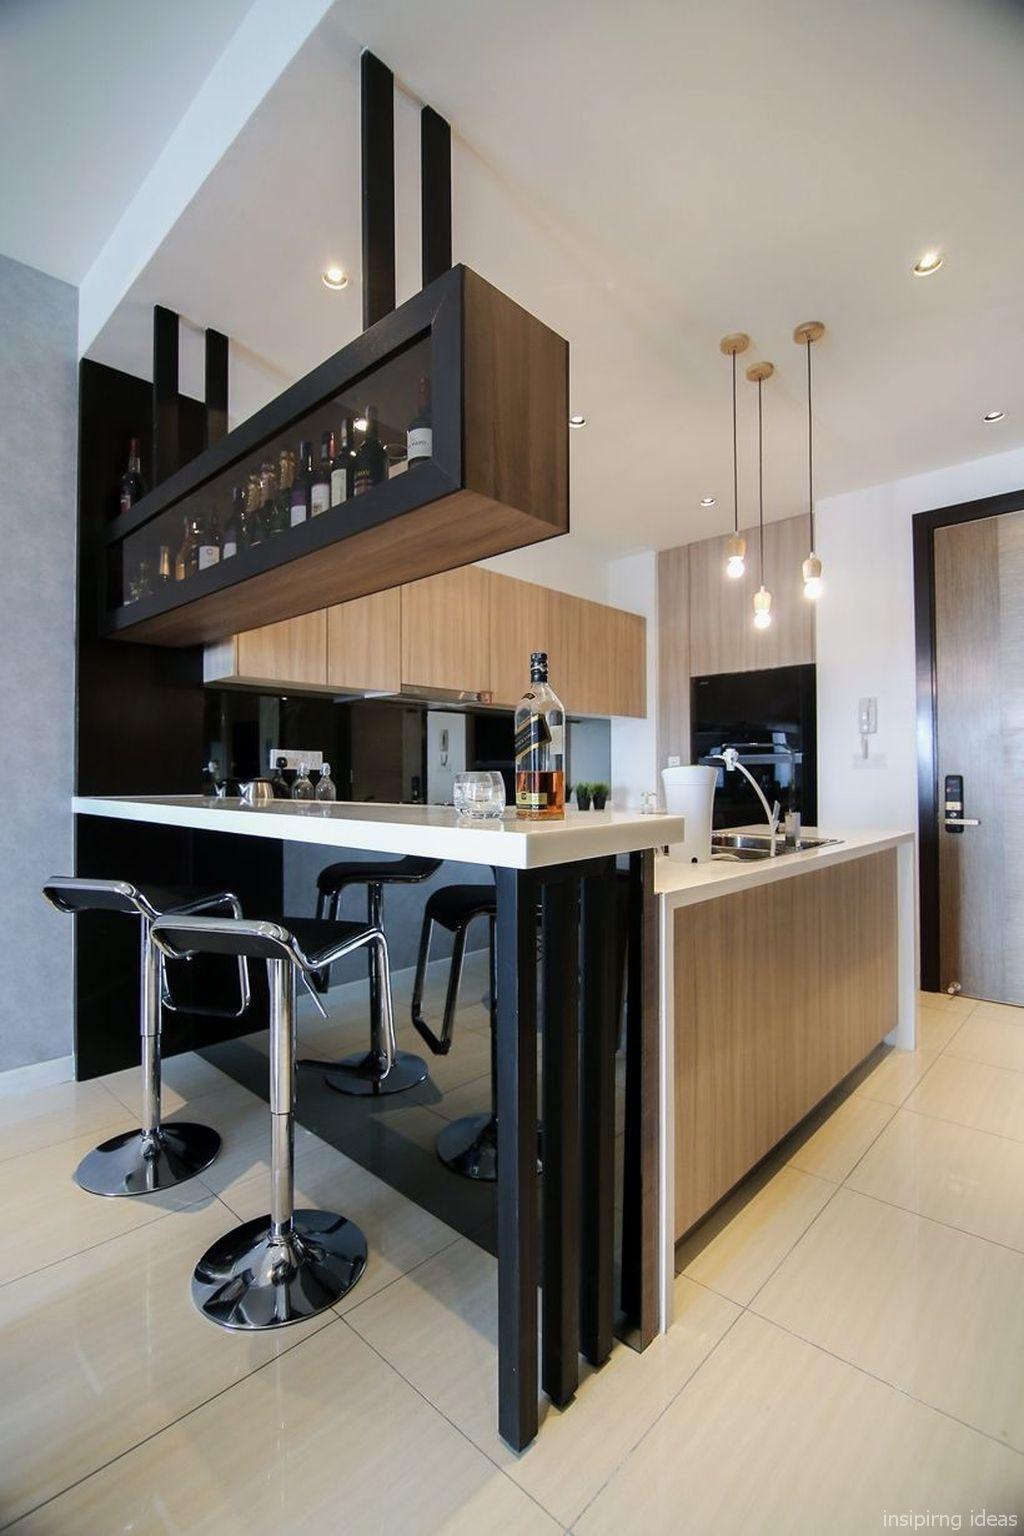 99 fabulous small modern kitchen decor ideas kitchen bar design small modern kitchens modern on interior design kitchen small modern id=43154